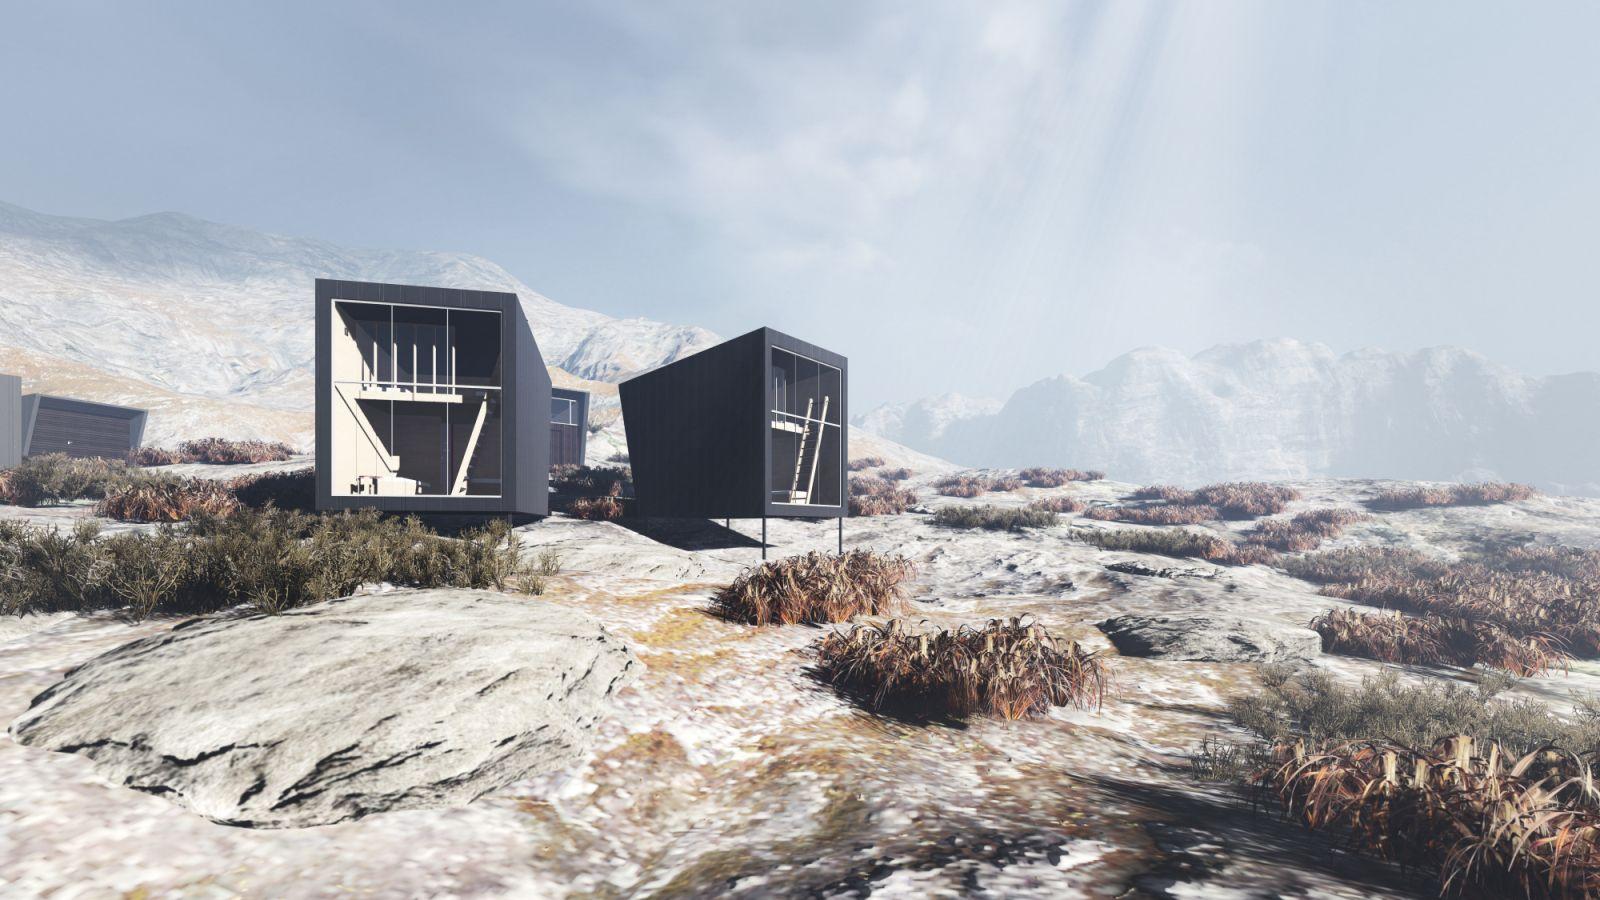 Nye Skapet Mountain Lodges In Soddatjorn By Koko Architects 05